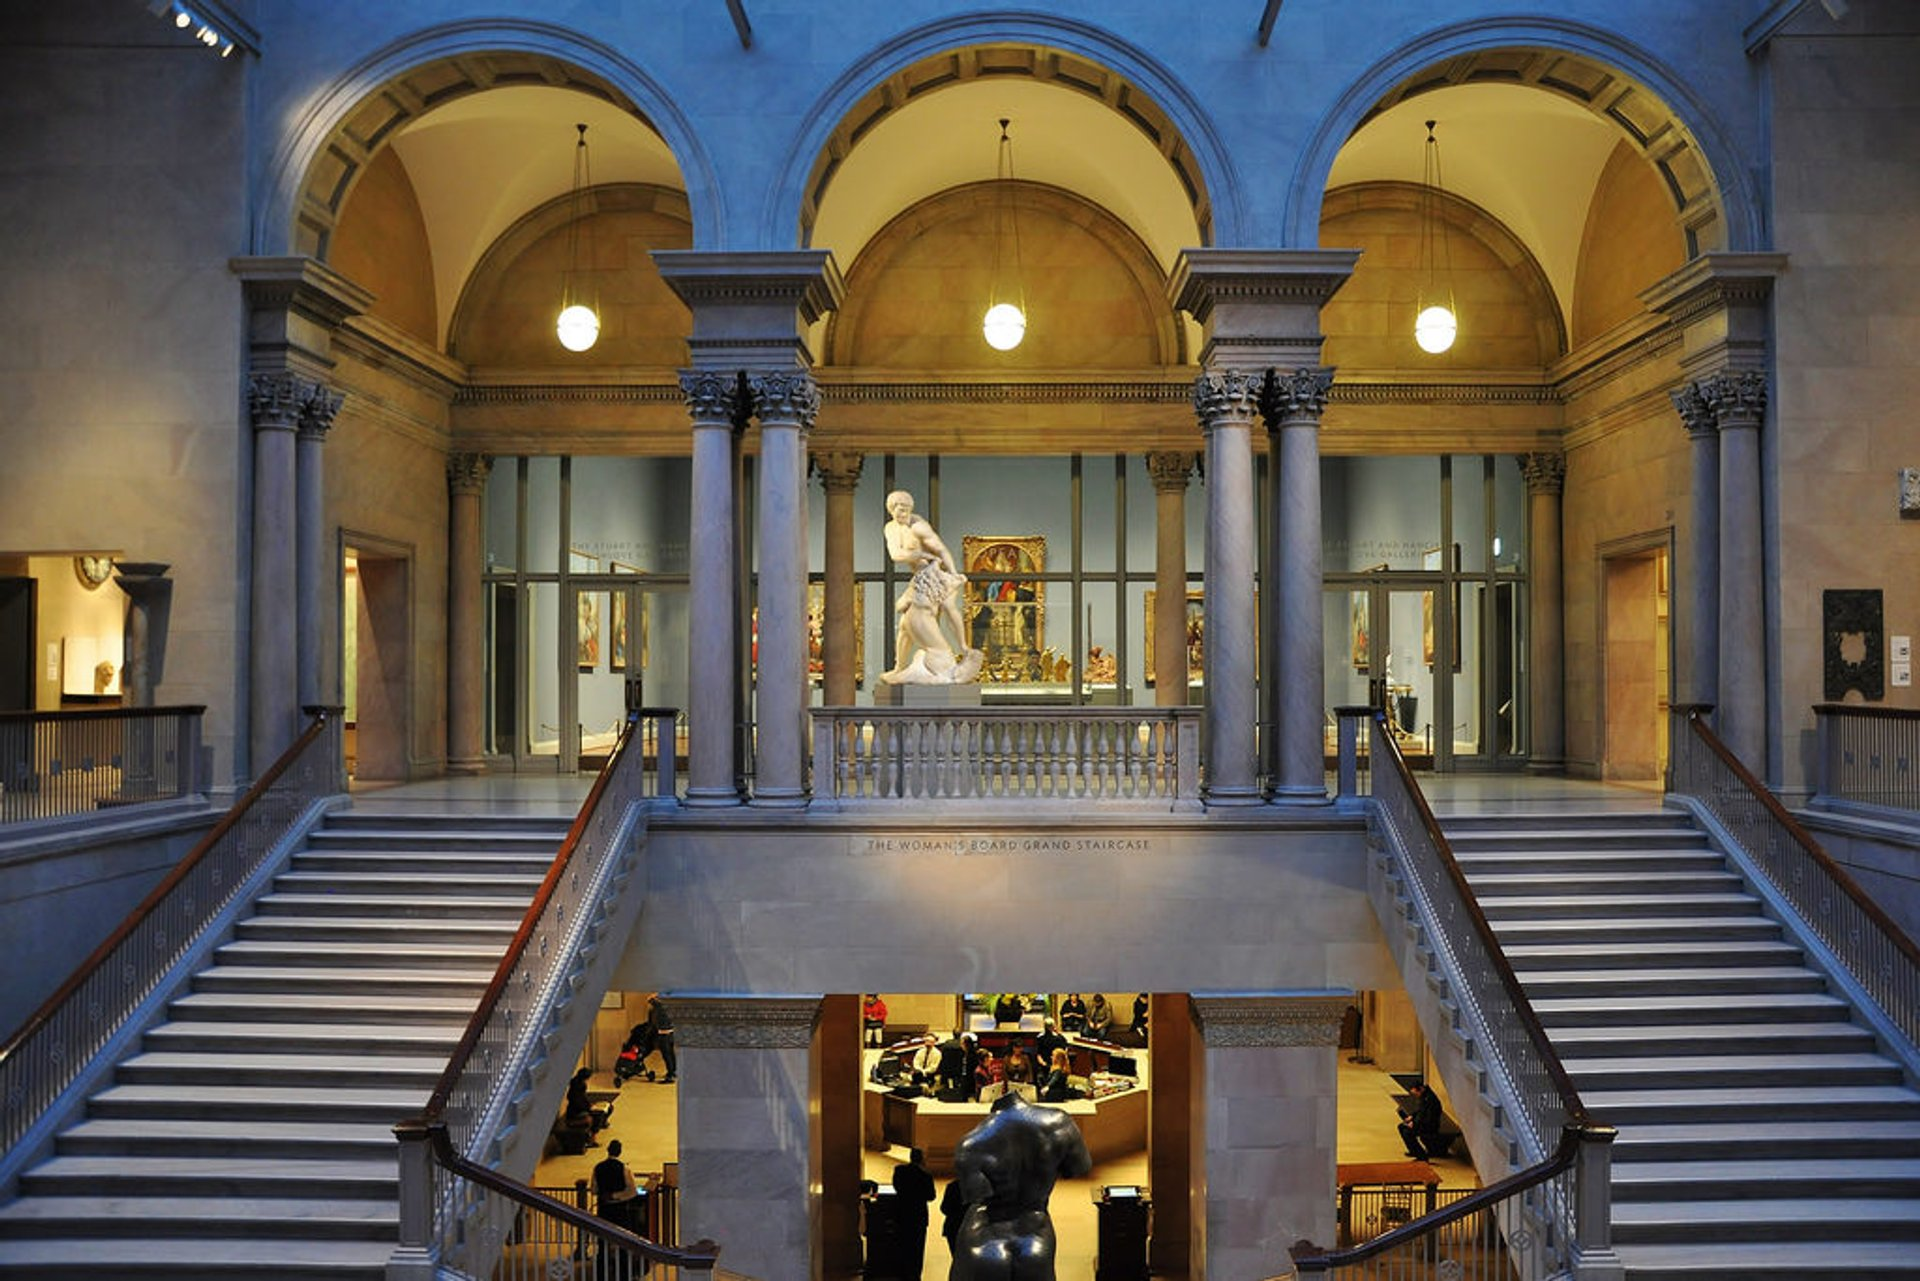 The beautiful Art Institute of Chicago 2020